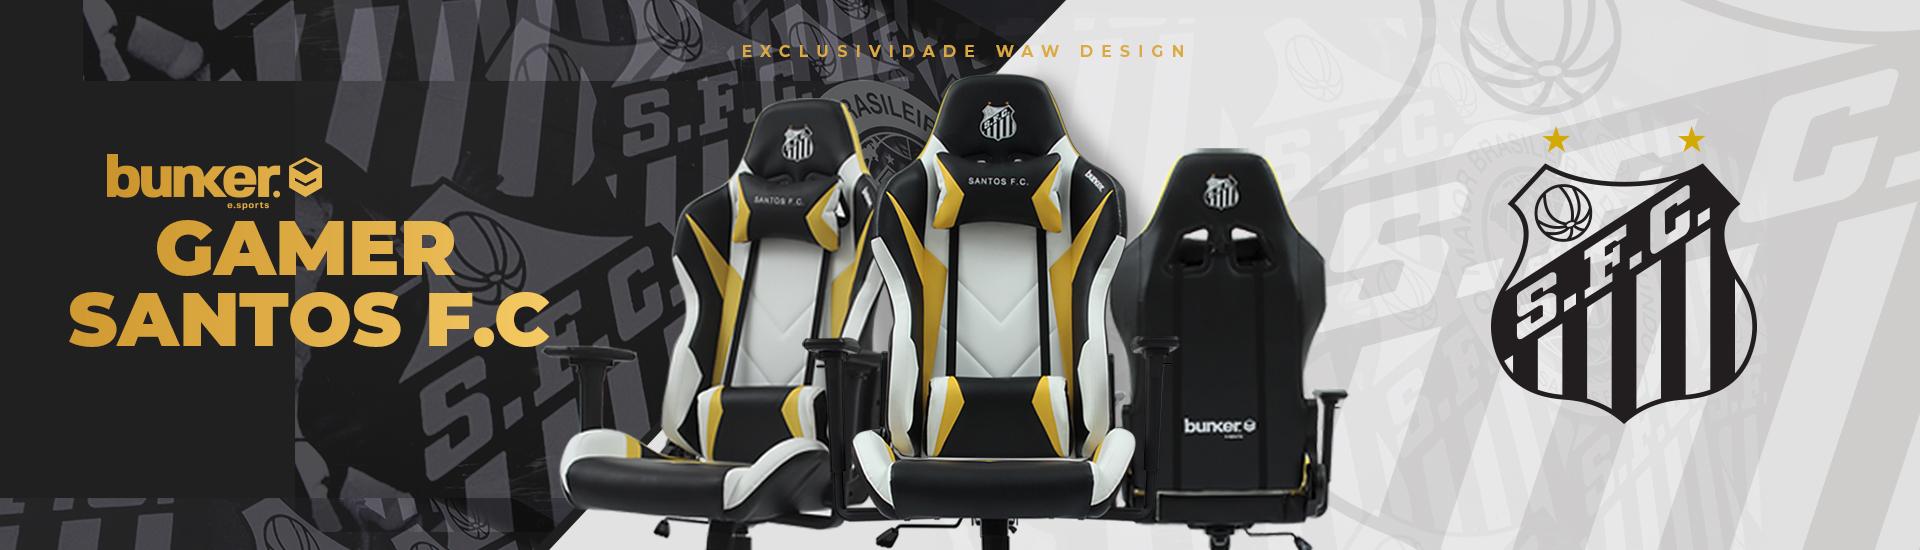 Waw Design | Banner - Bunker Santos